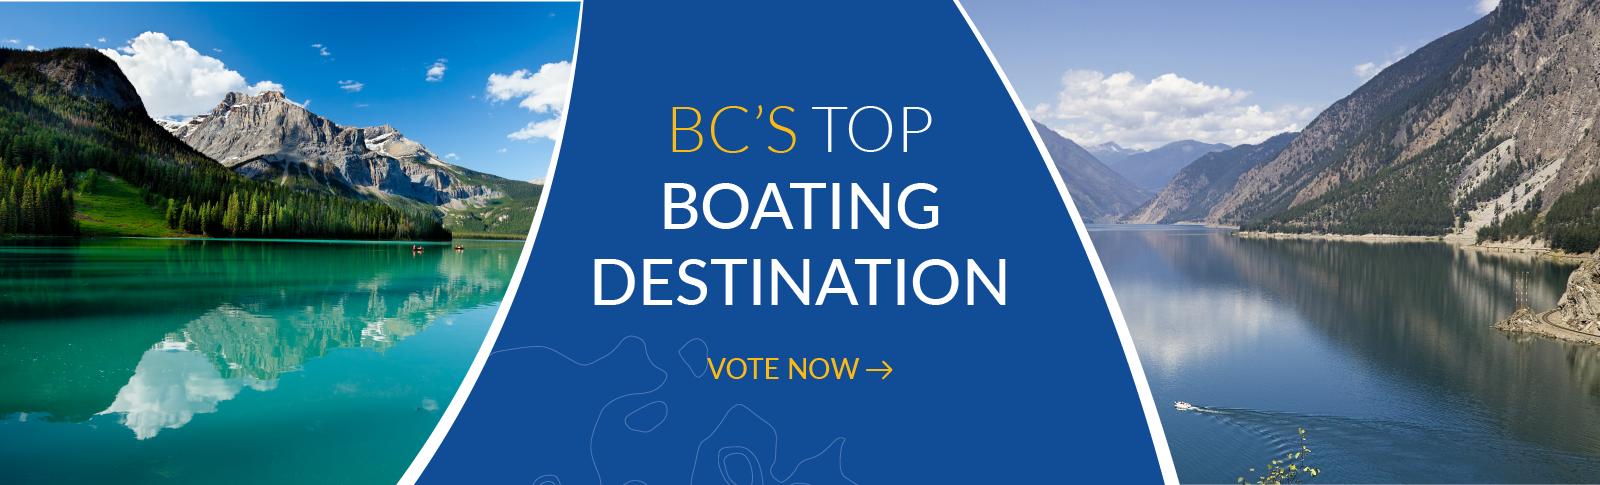 Top Boating Destination BC